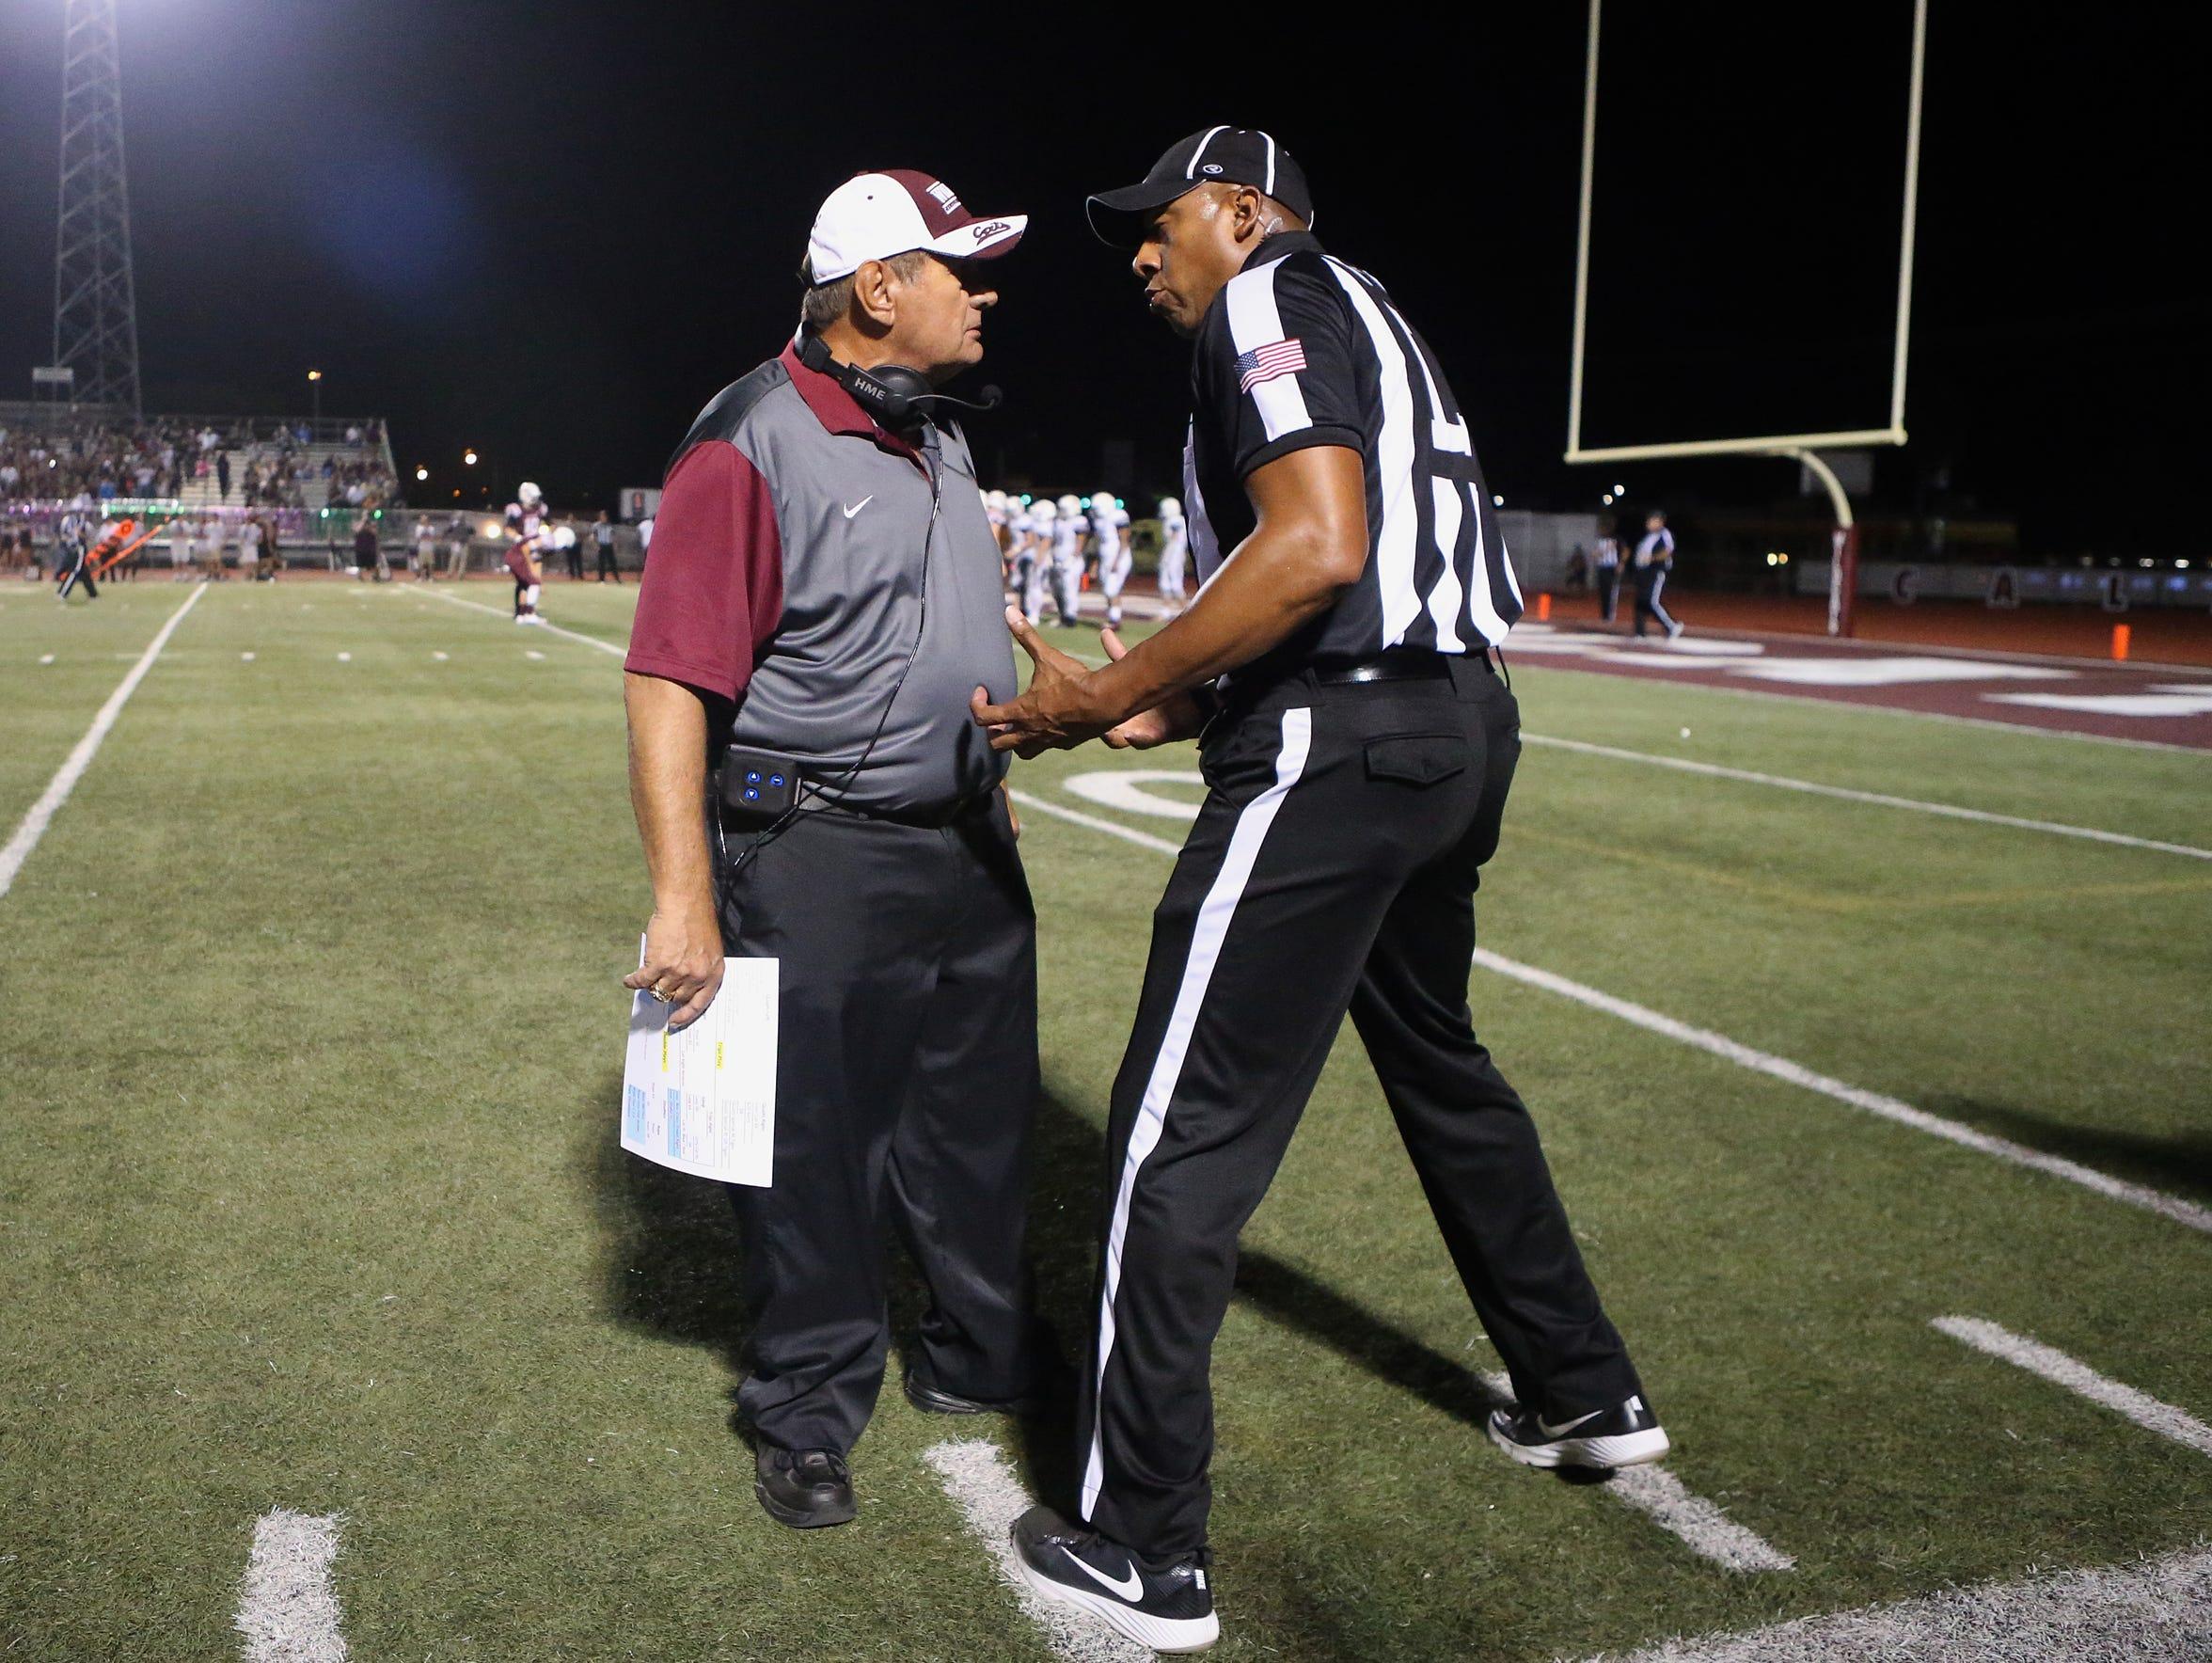 GABE HERNANDEZ/CALLER-TIMESCalallen head coach Phil